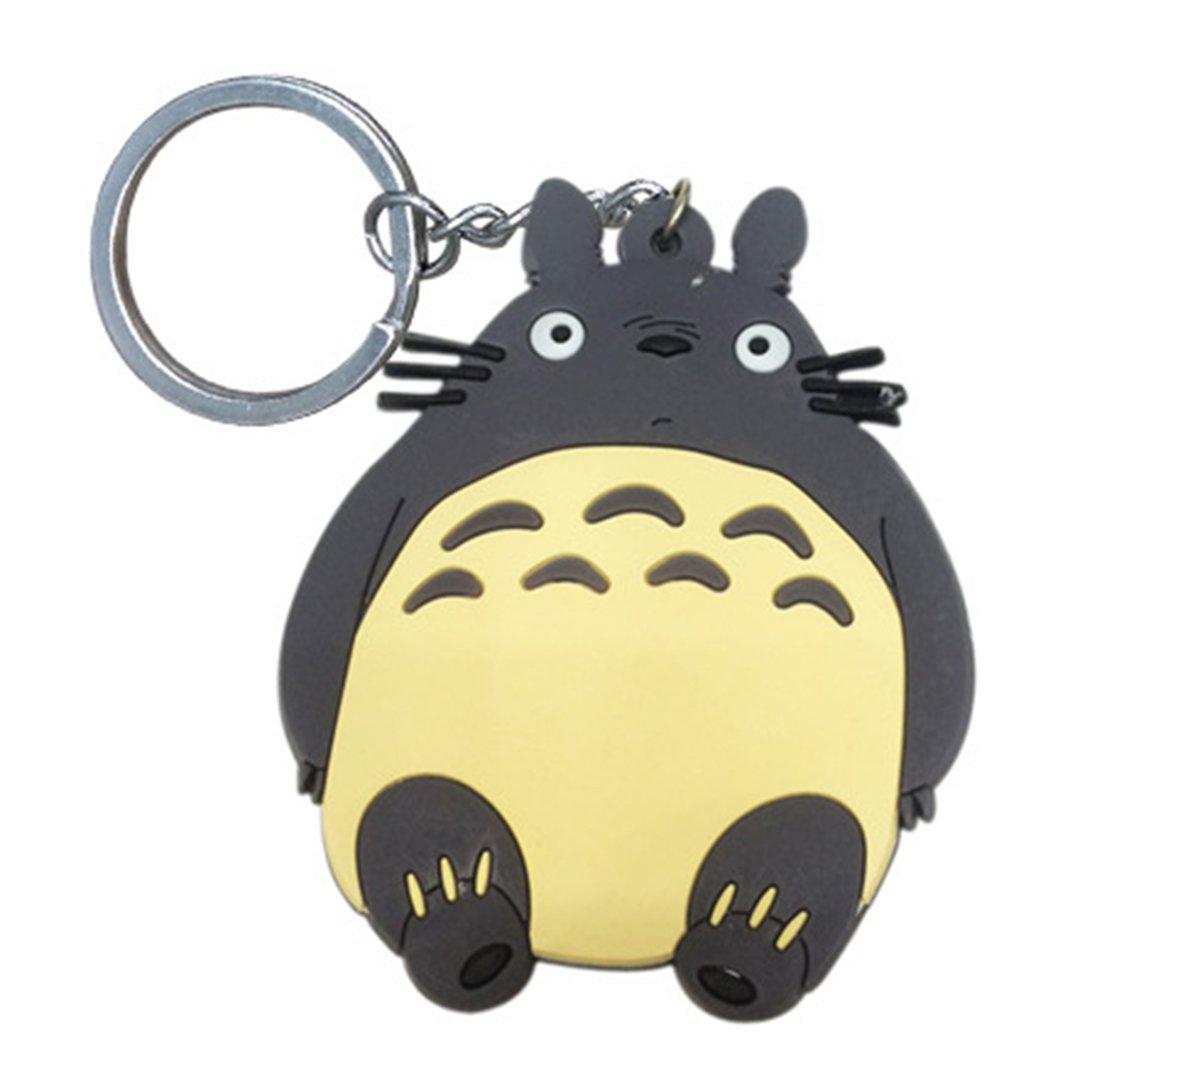 1pc Cartoon Totoro Keychain Key Ring Backpack Decors Birthday Festival Gift